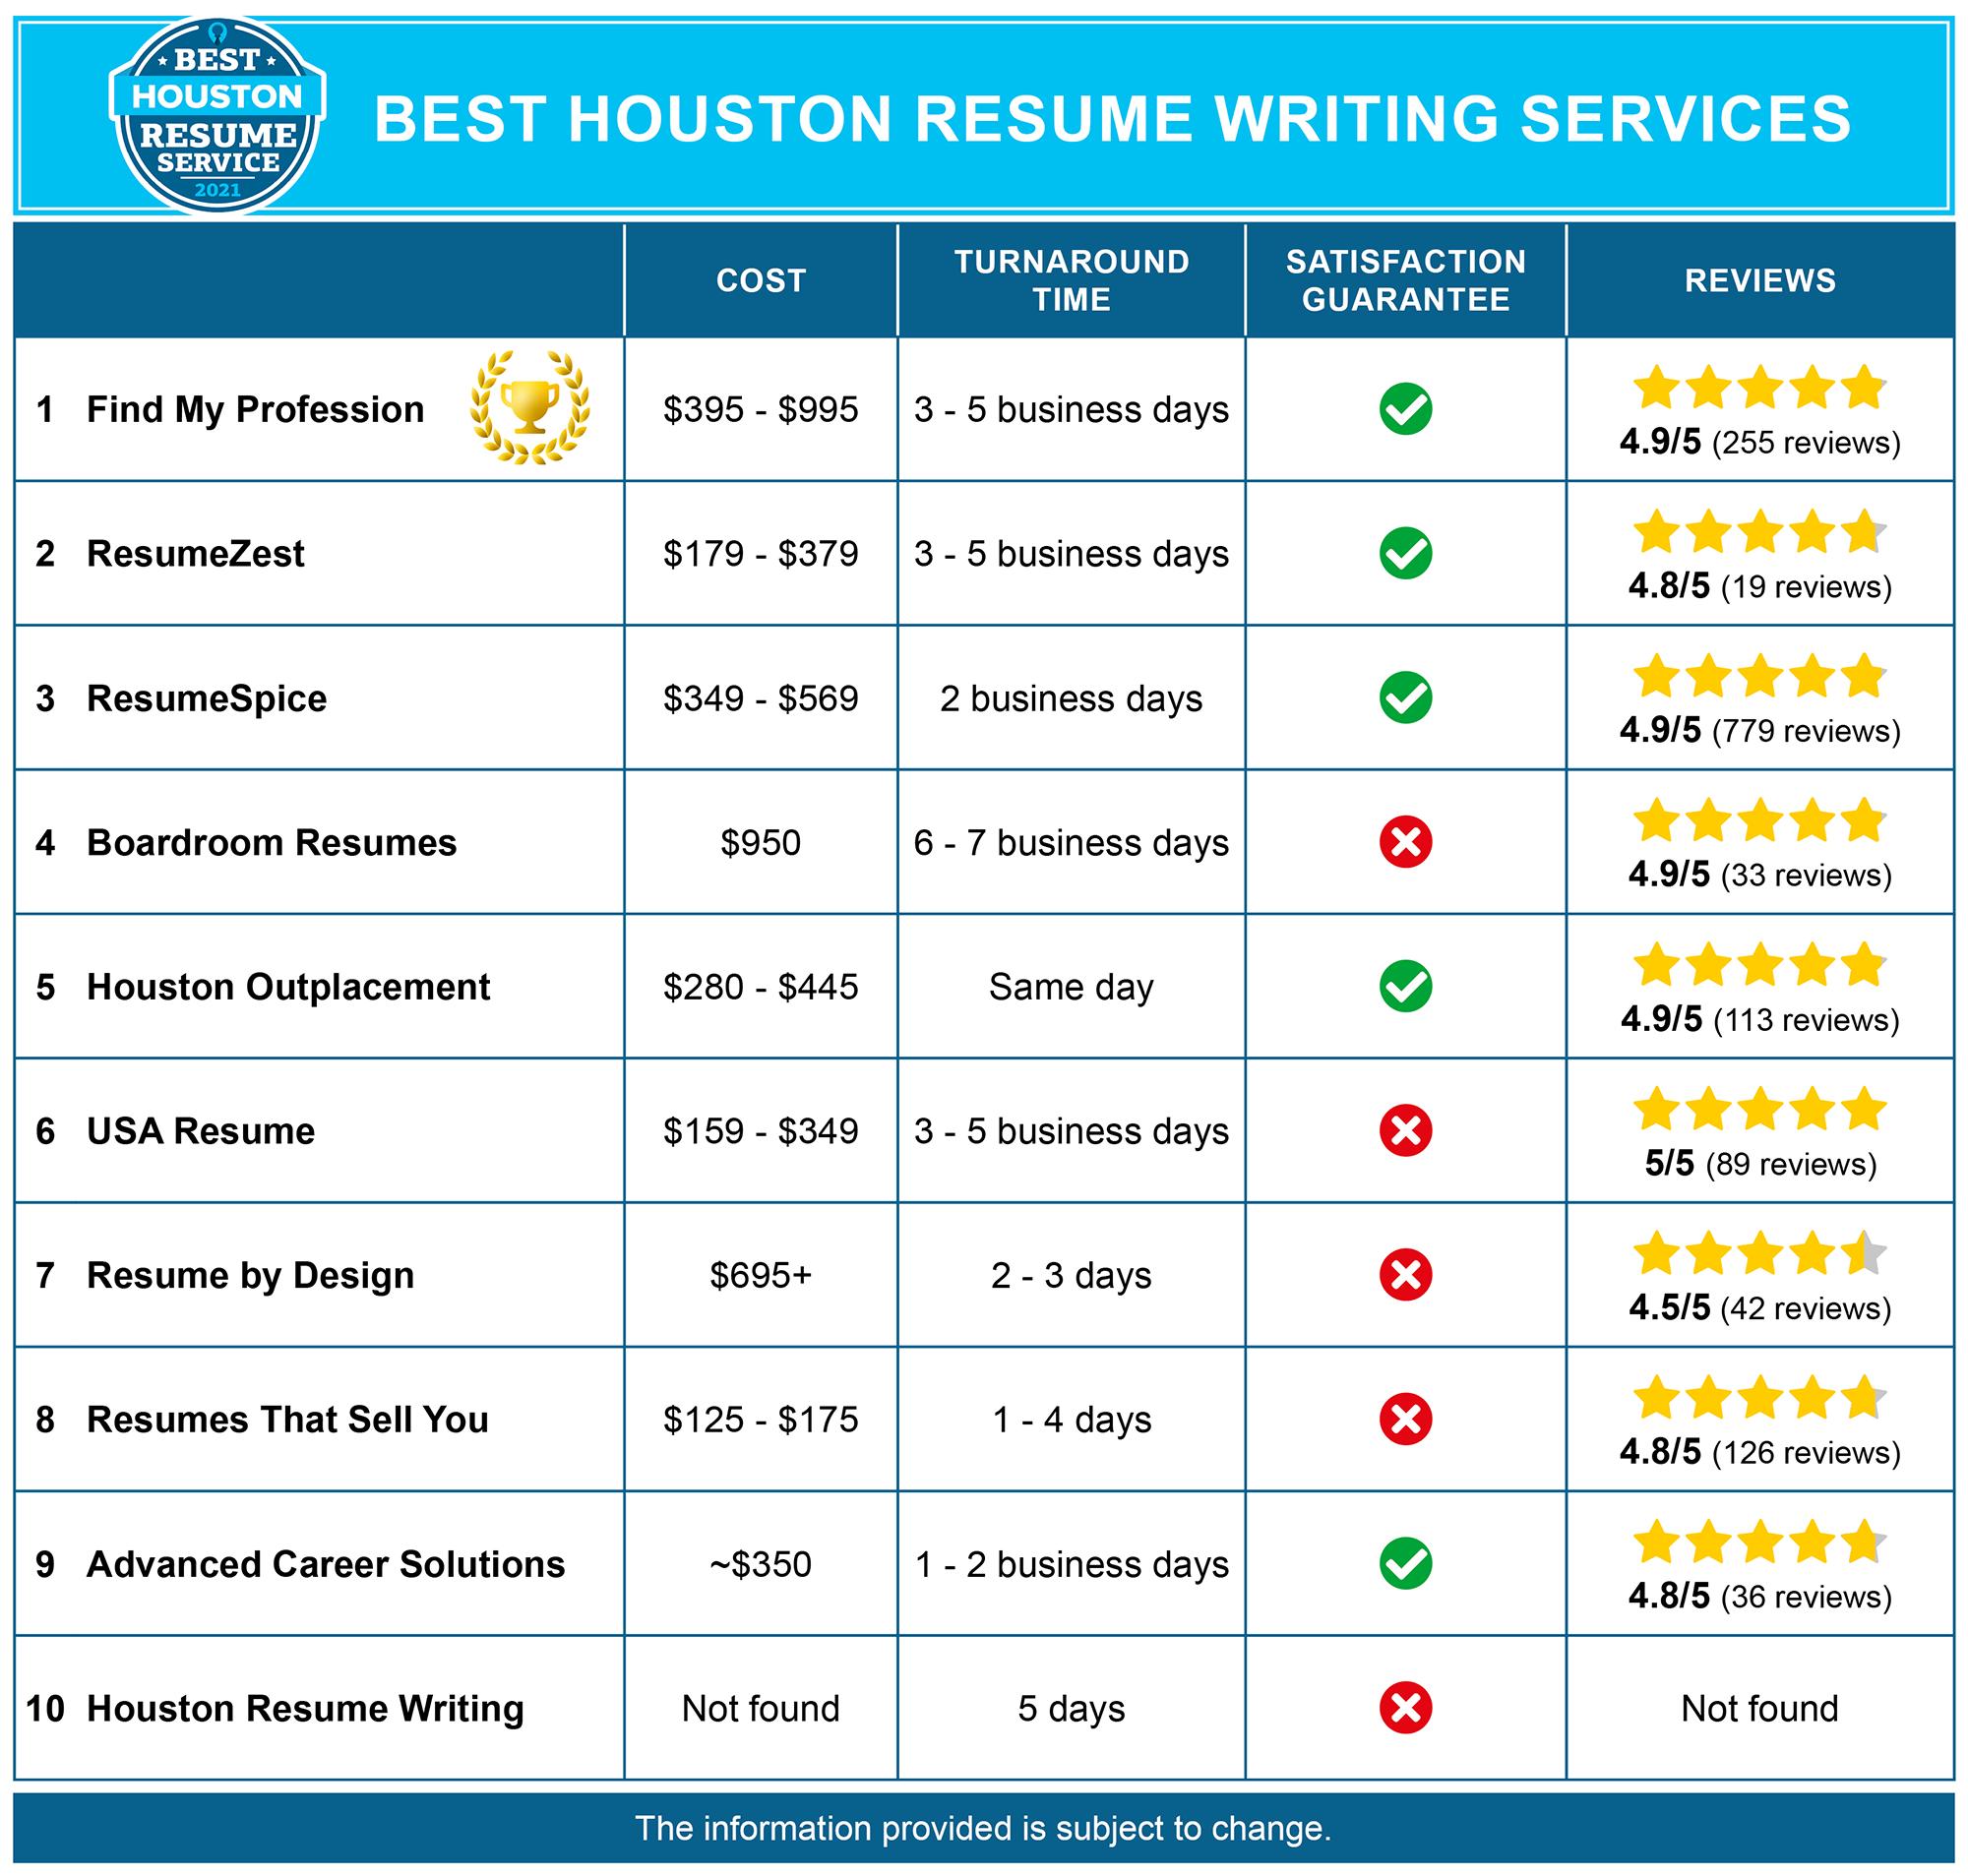 Best Houston Resume Services